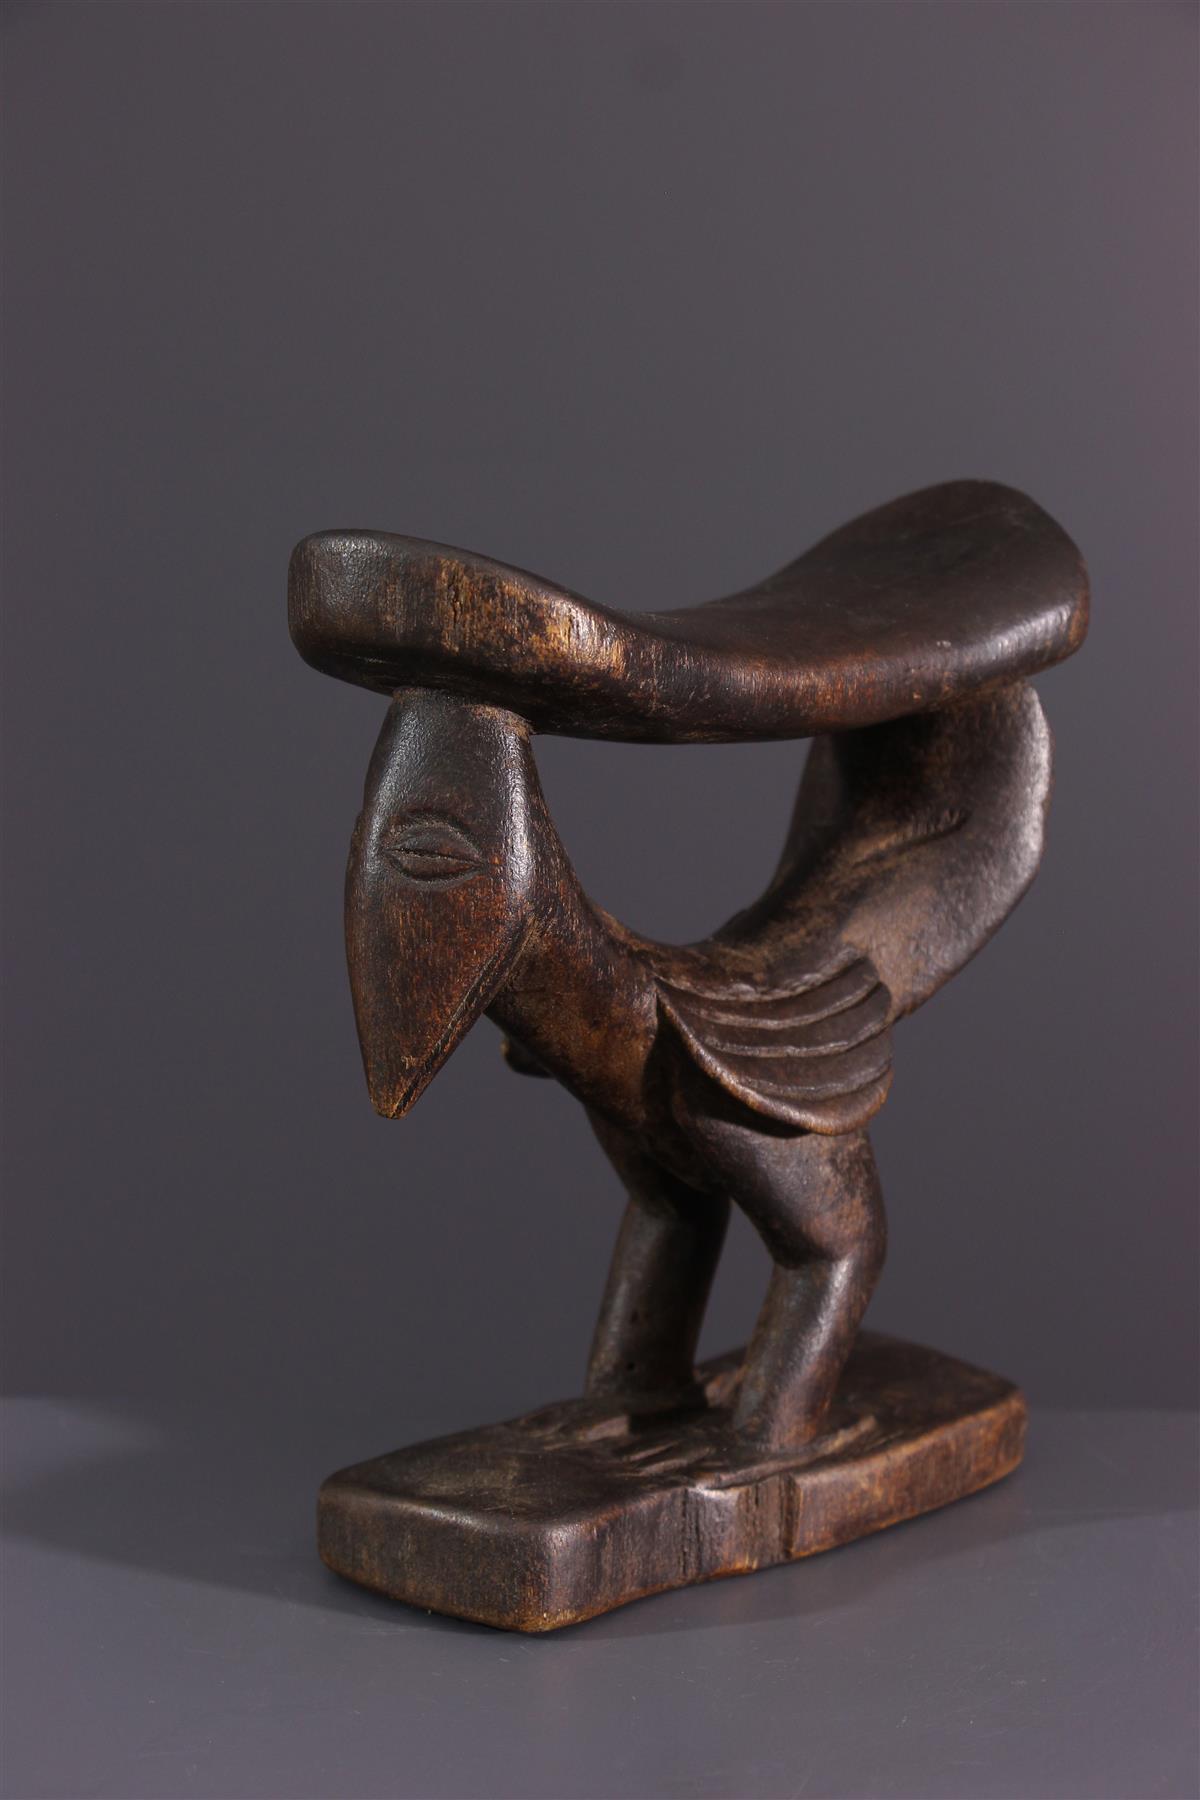 Yaka neck support - African art